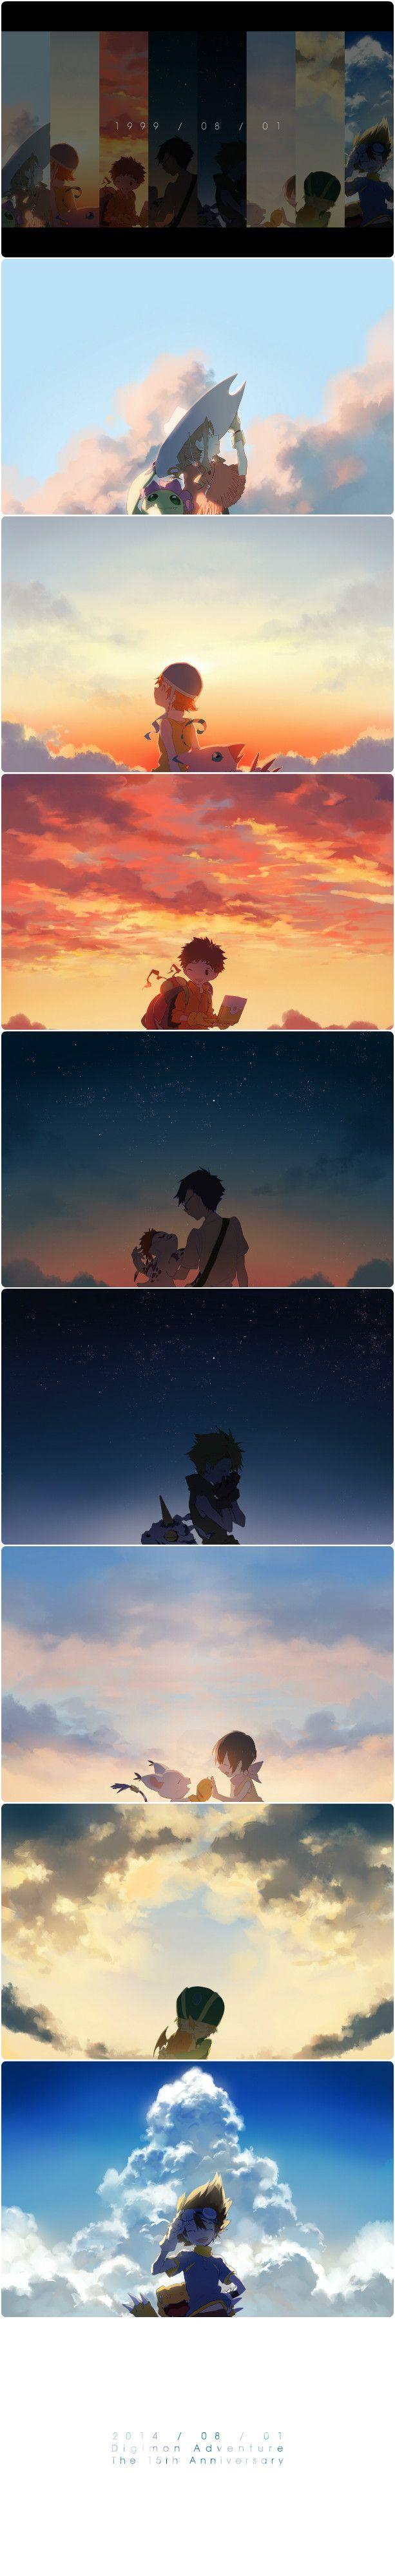 summer sky - digimon adventure